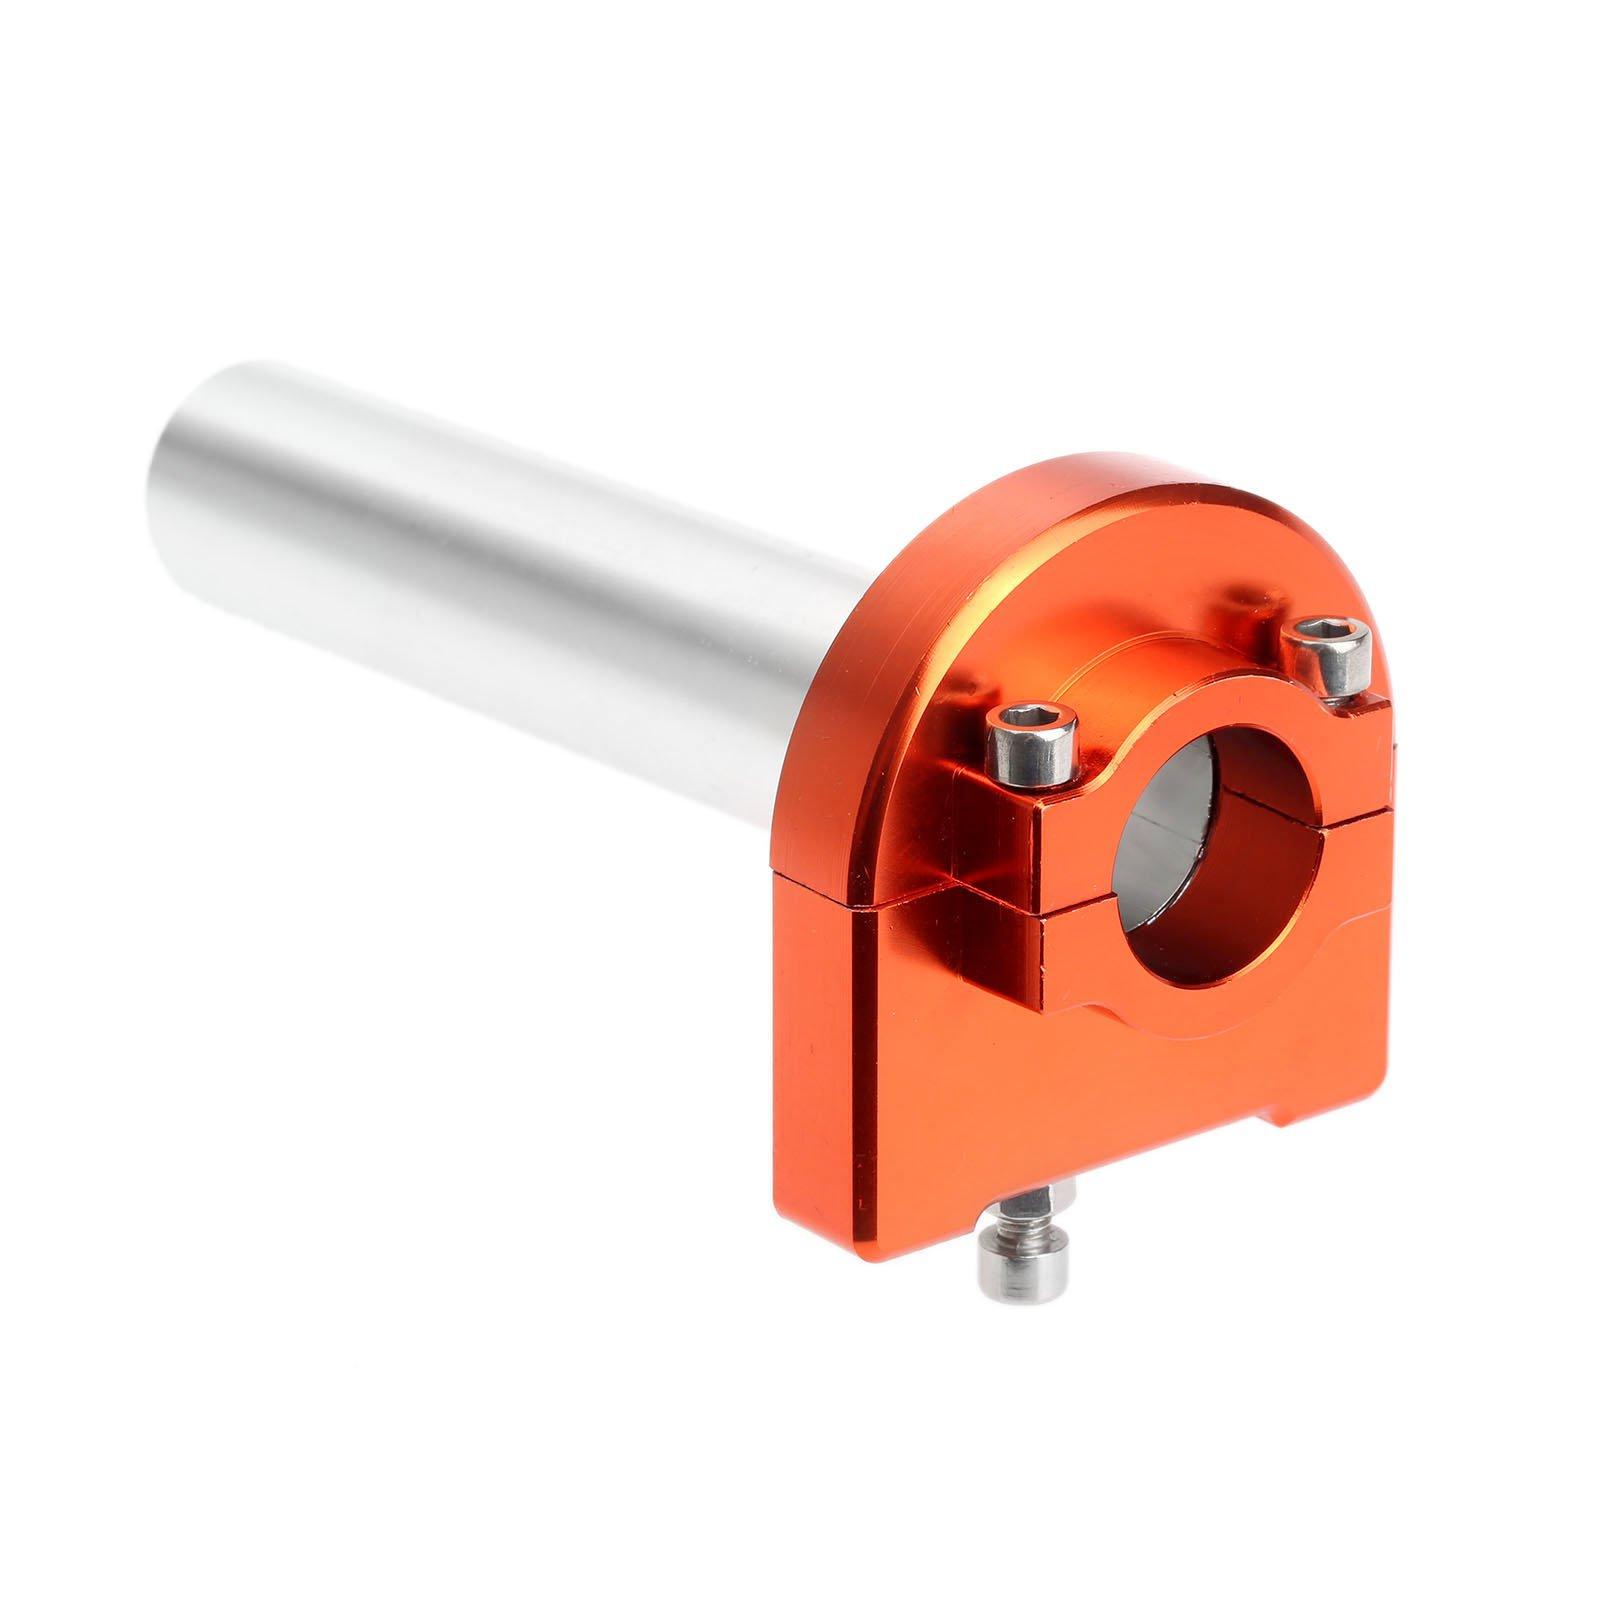 Mtsooning 1Pc Orange 7/8 CNC Aluminum Hand Grips Throttle Tube for Honda, Kawasaki, Suzuki, Yamaha, KTM